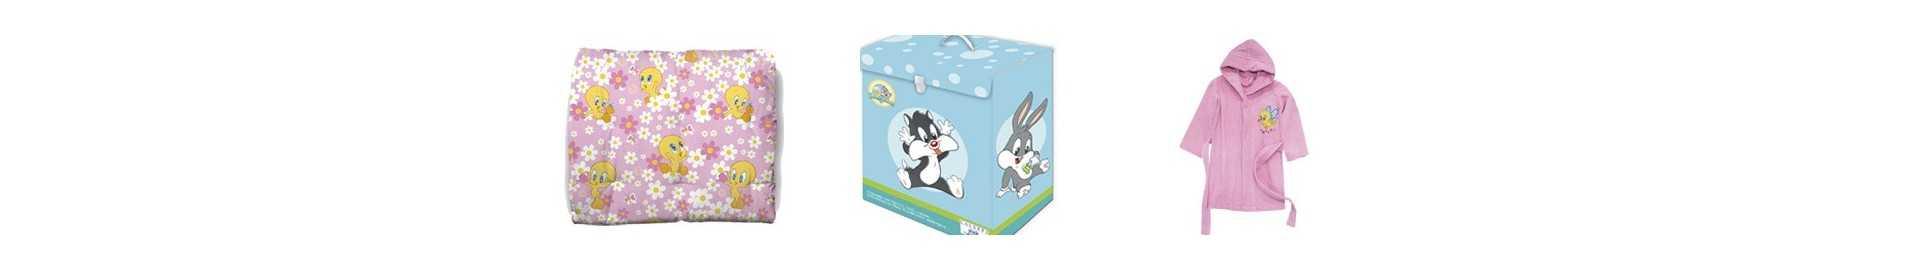 Tweety - Looney Tunes